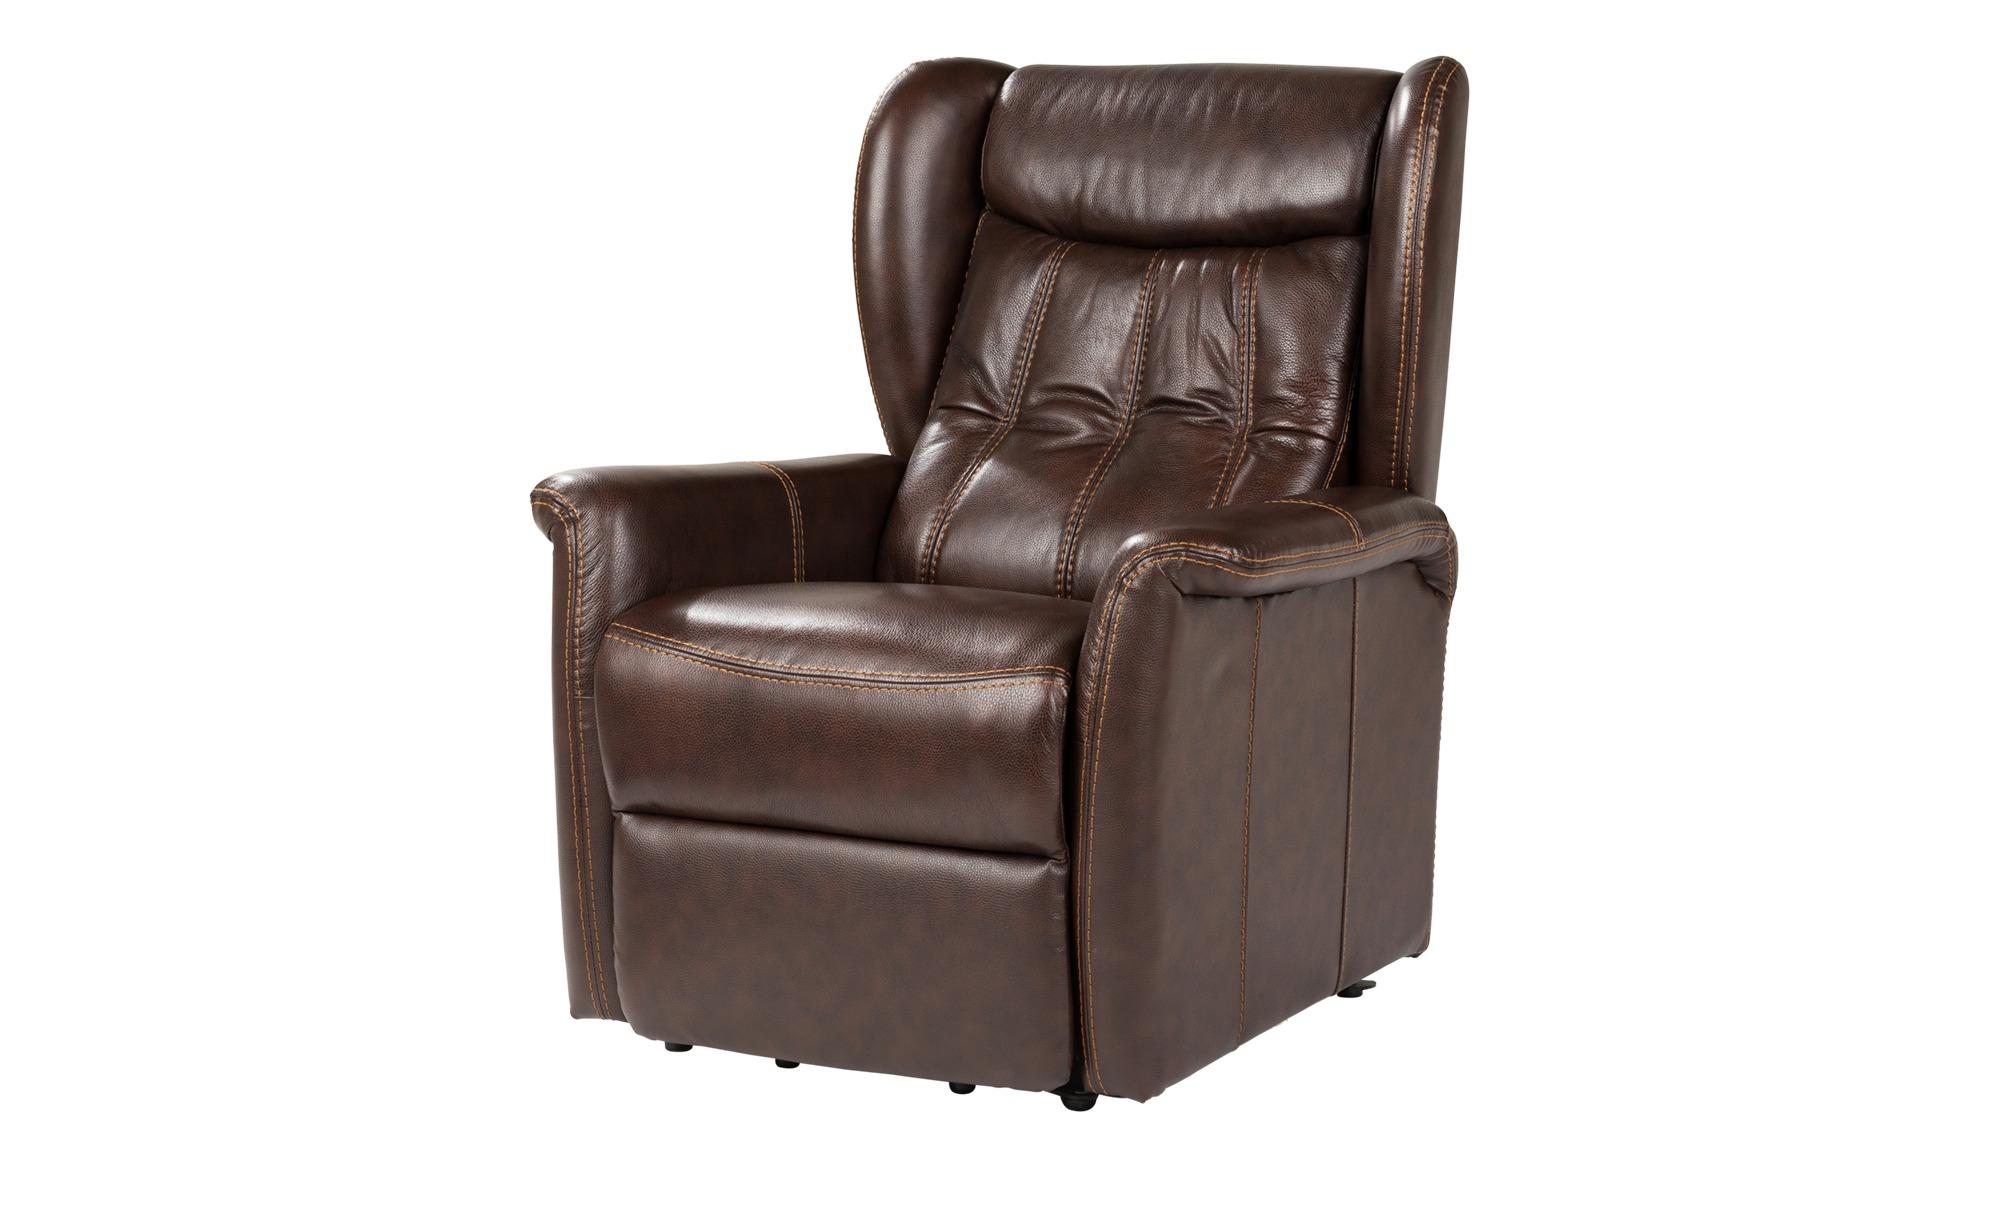 uno Fernsehsessel mit Relaxfunktion braun - Leder Idita ¦ braun ¦ Maße (cm): B: 86 H: 102 T: 93 Polstermöbel > Sessel > Ledersessel - Höffner